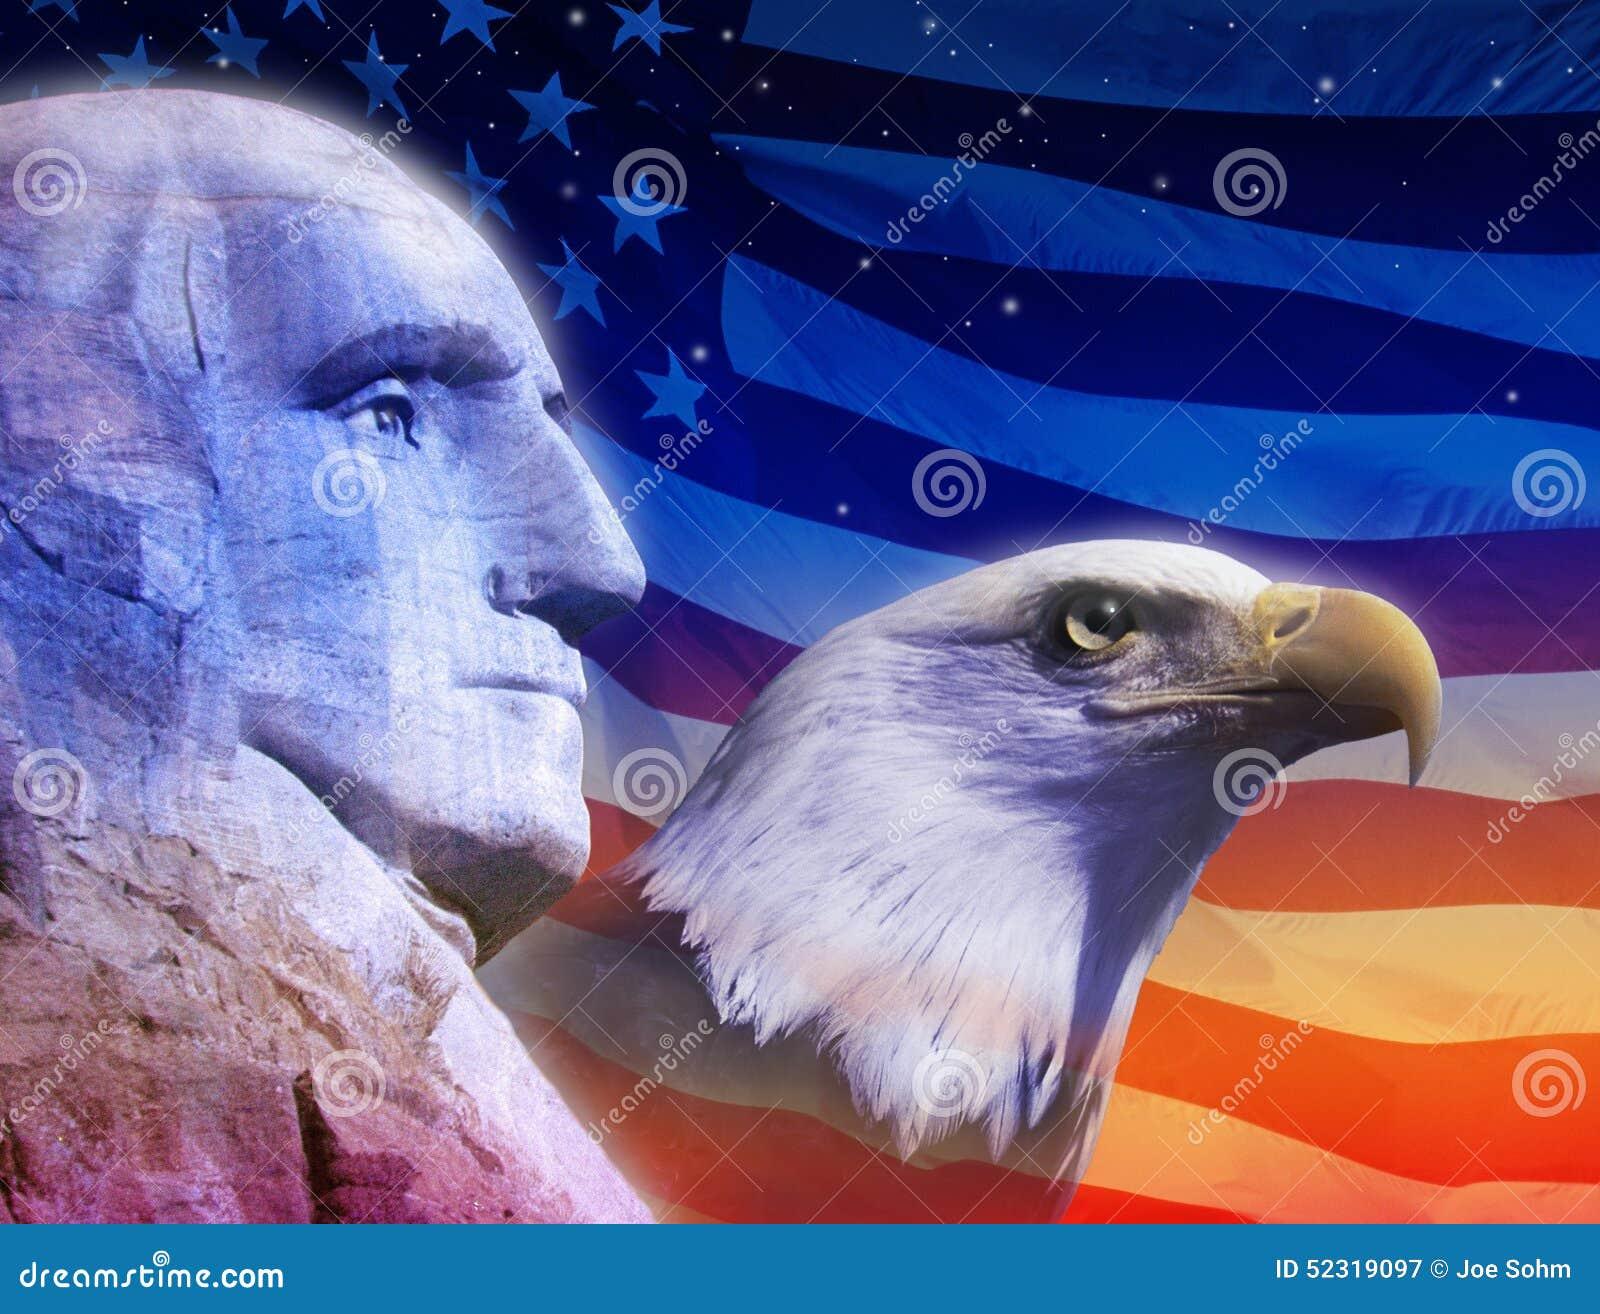 profile of president george washington the american flag